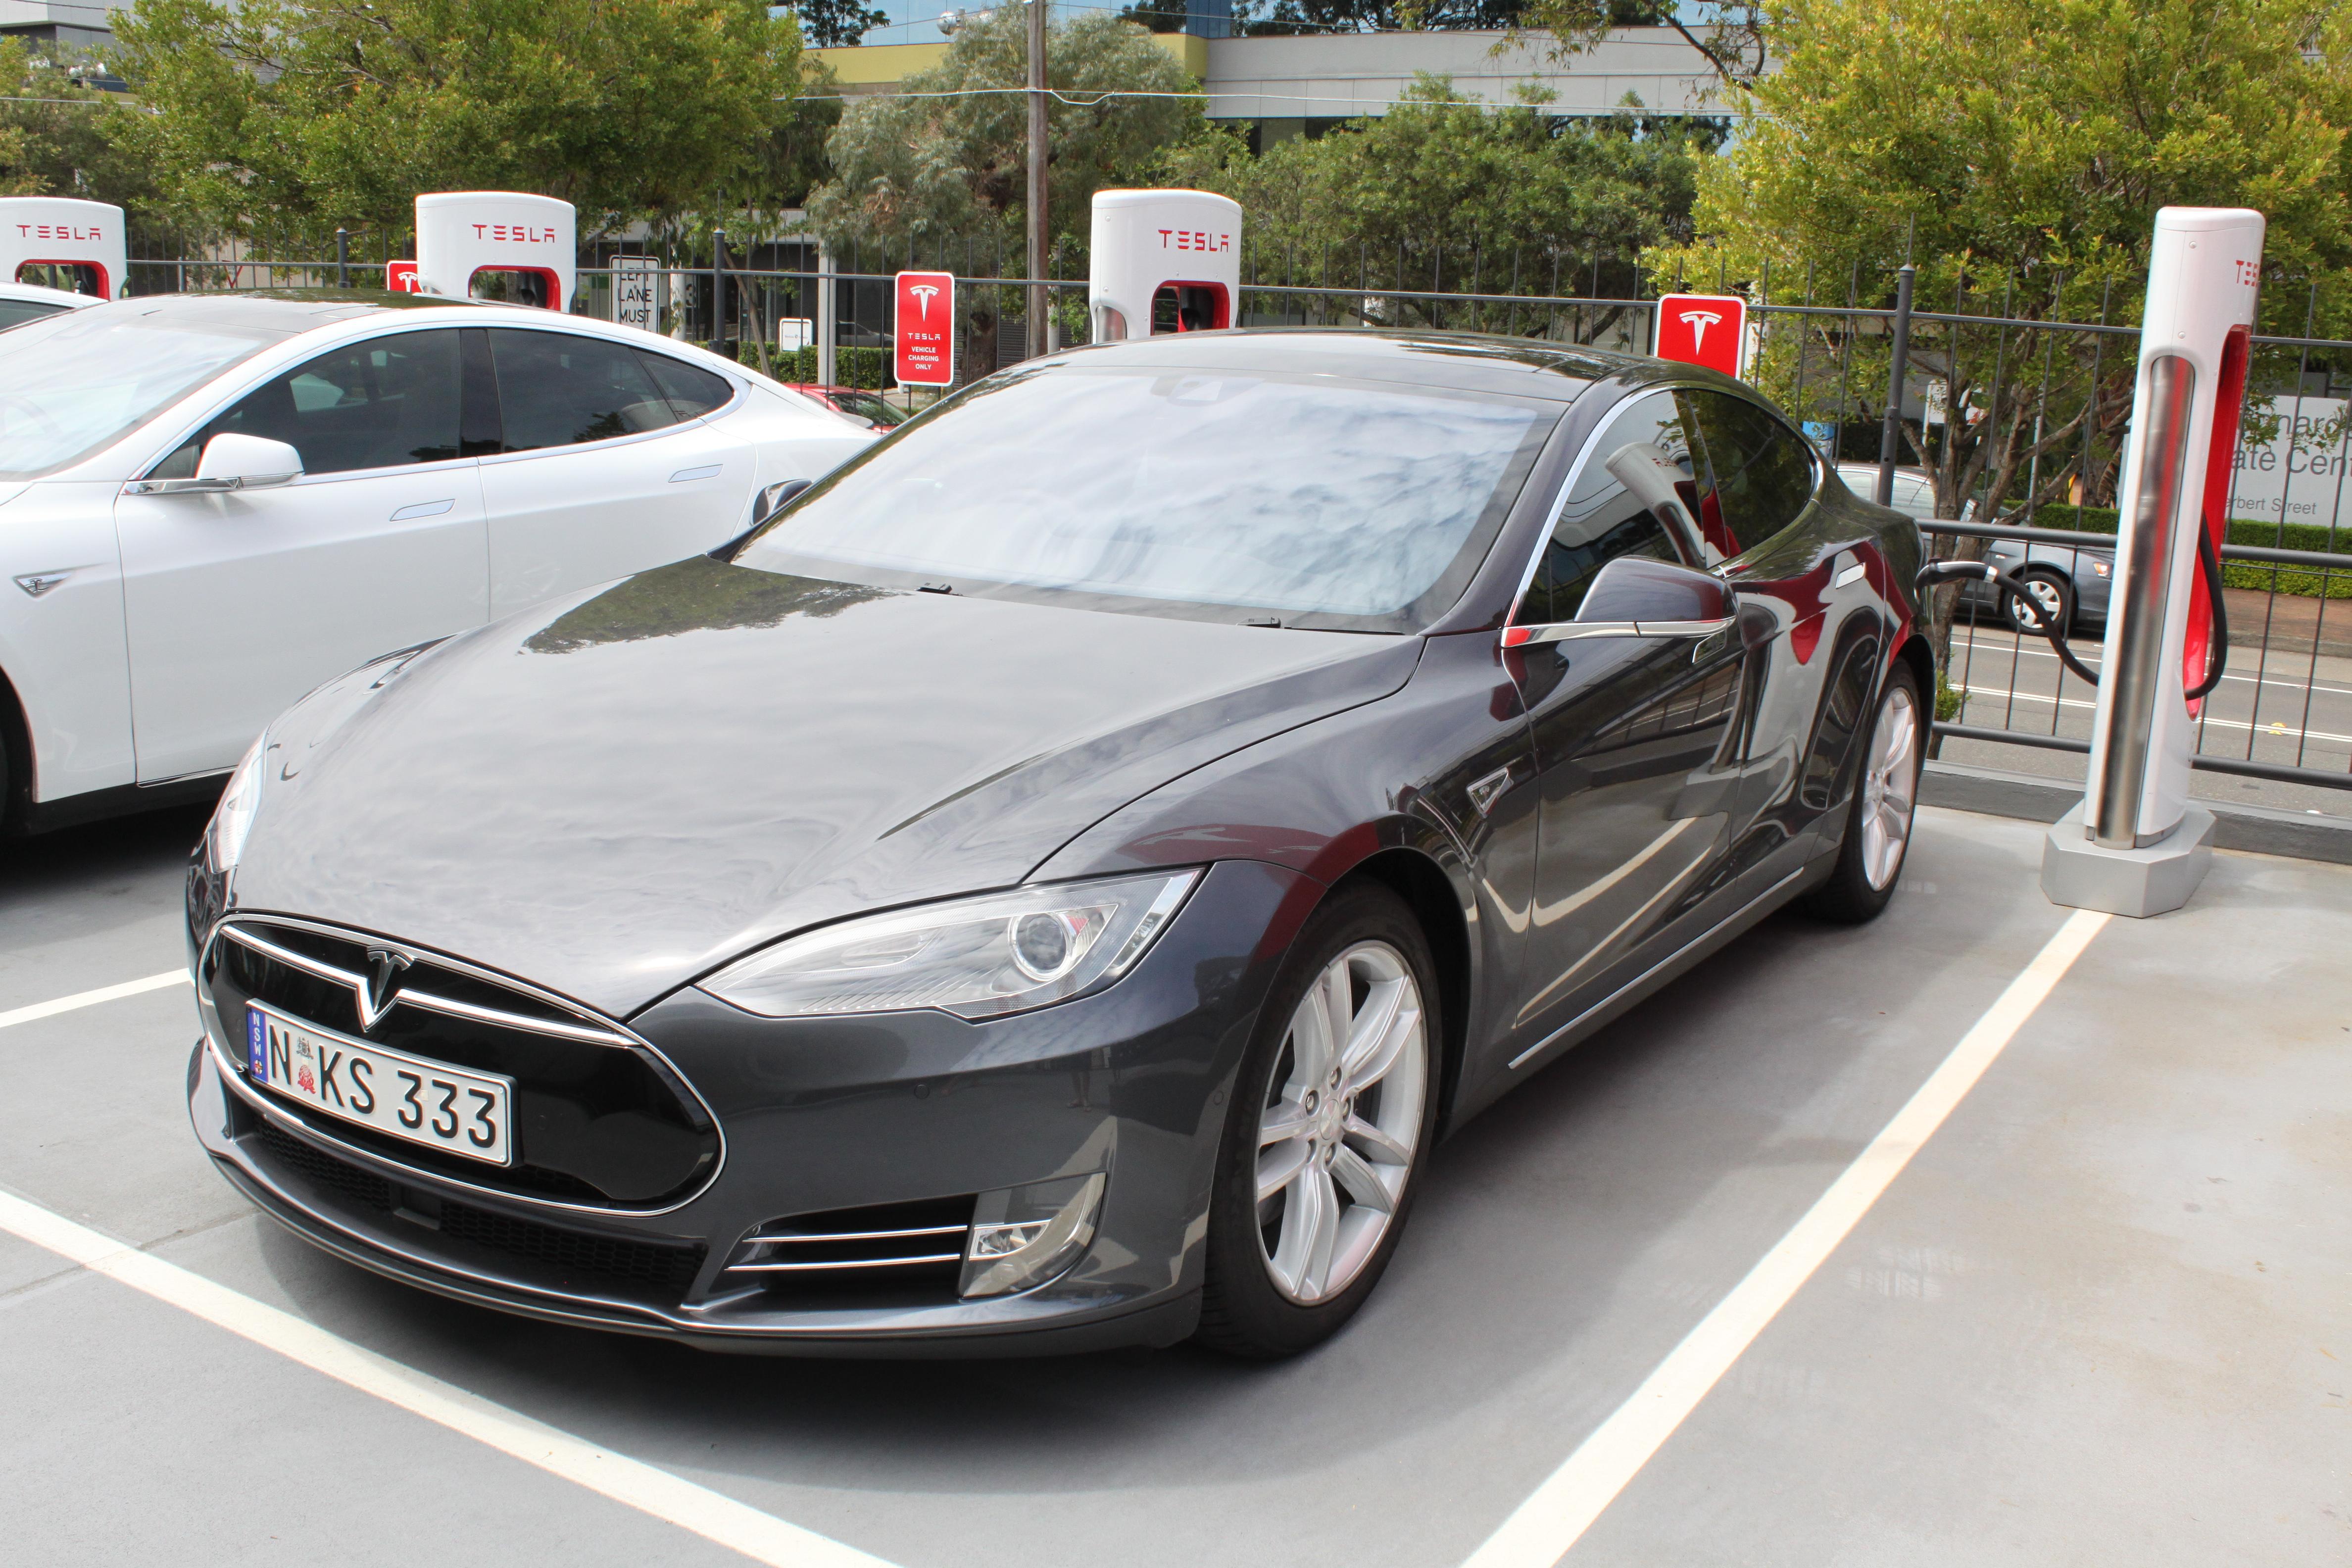 File:2015 Tesla Model S hatchback (24364892816) jpg - Wikimedia Commons